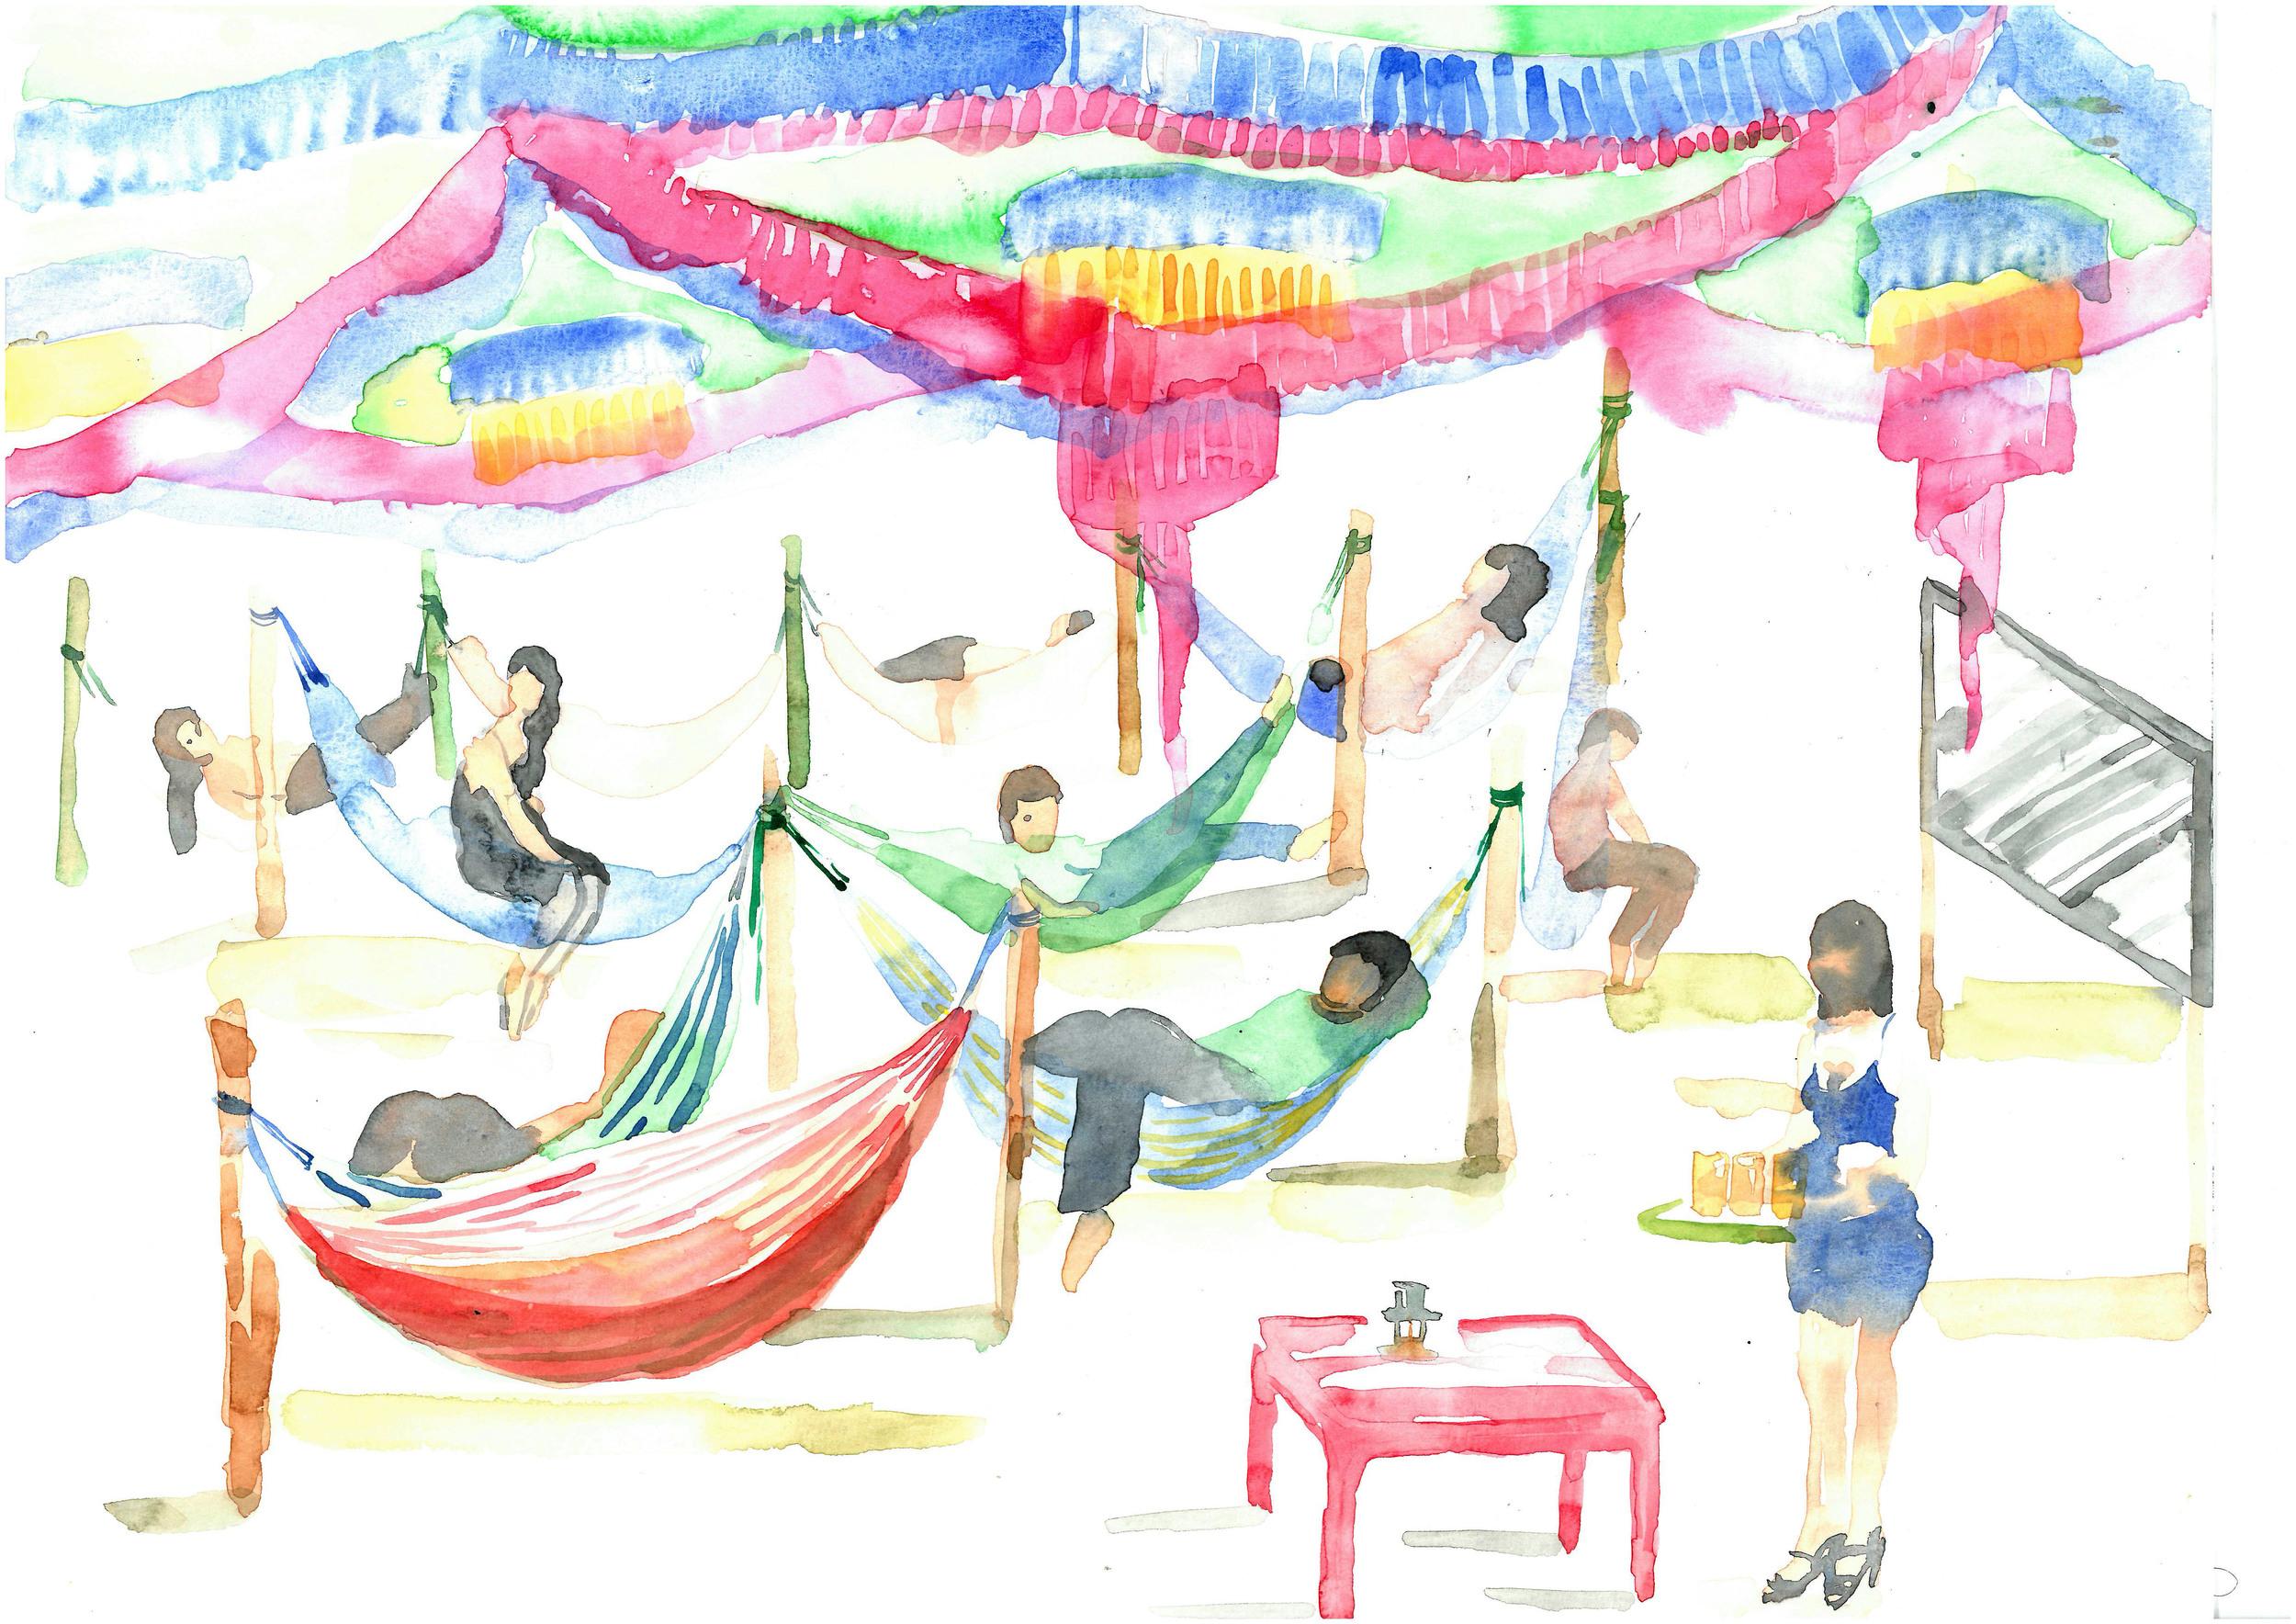 artlabor_Jarai Dew_hammock cafe 1